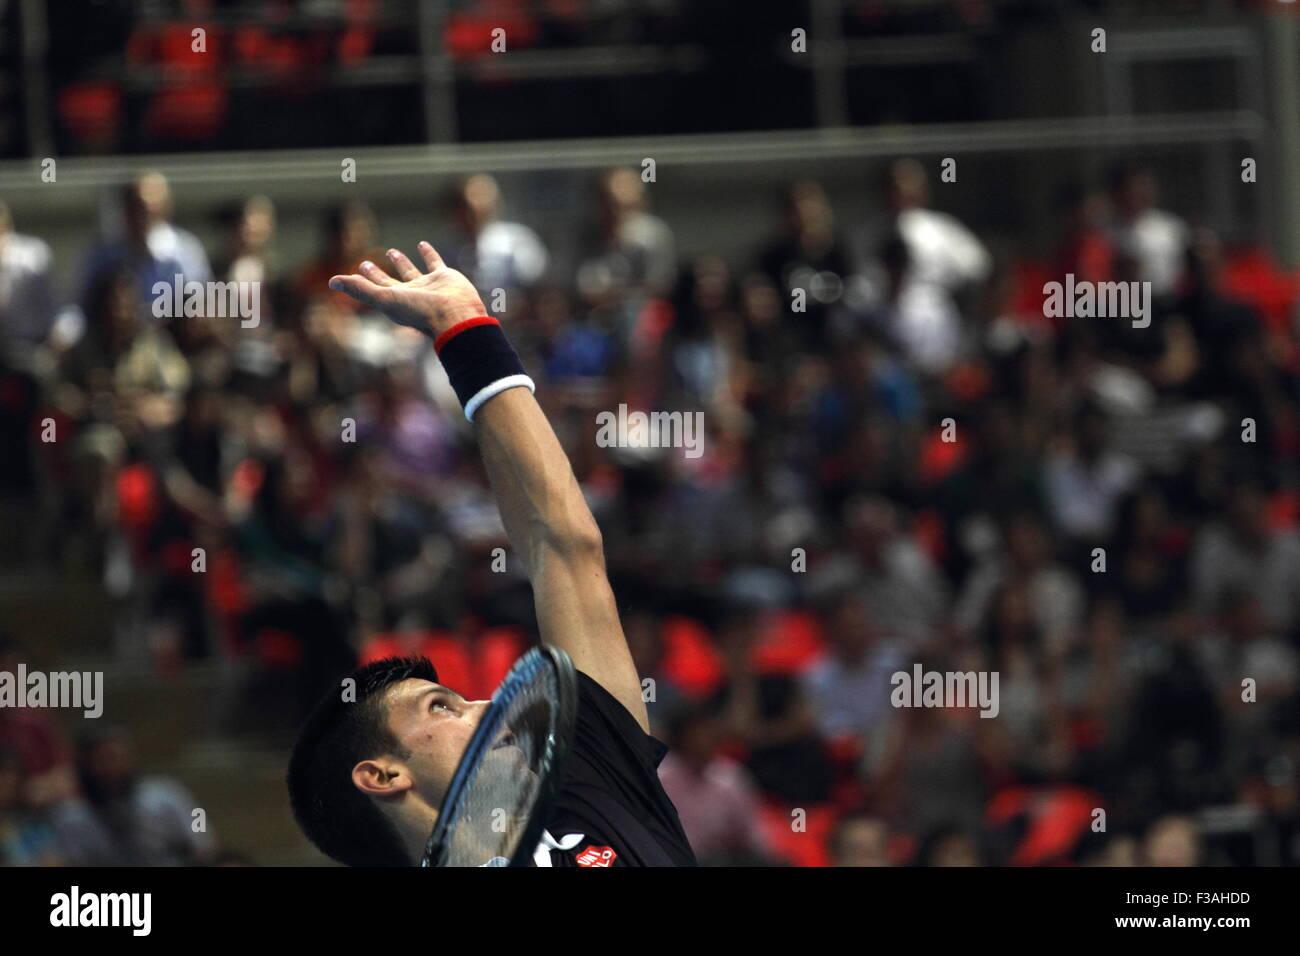 Bangkok, Thailand 02nd Oct 2015. Novak Djokovic of Serbia in actions during the Rafael Nadal v Novak Djokovic exhibition - Stock Image